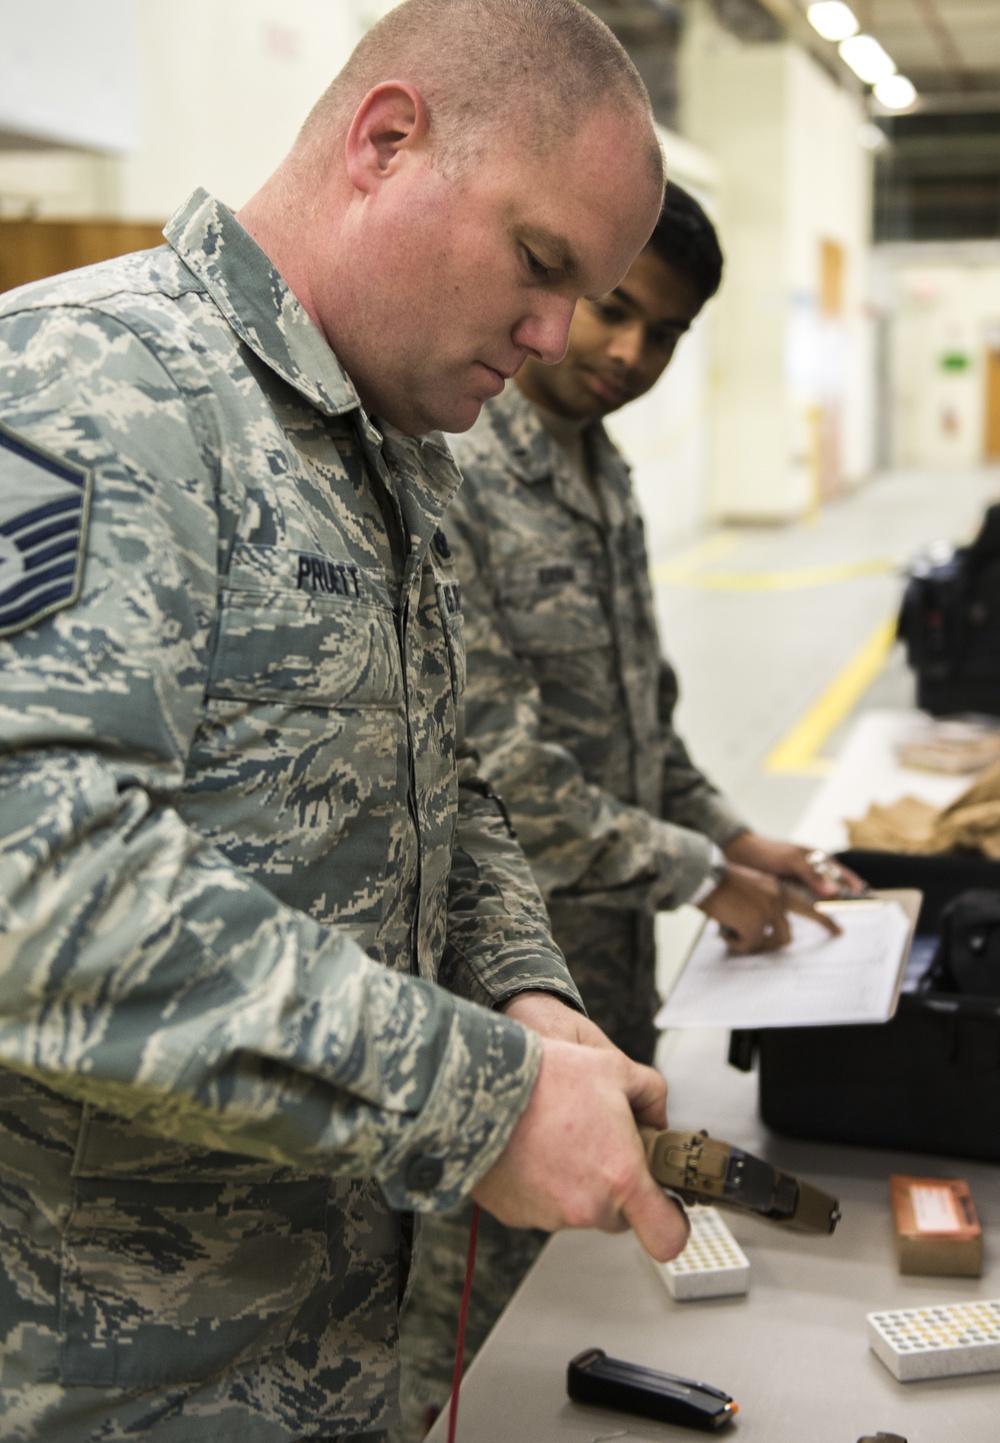 AFOTEC Team Tests New Modular Handgun System